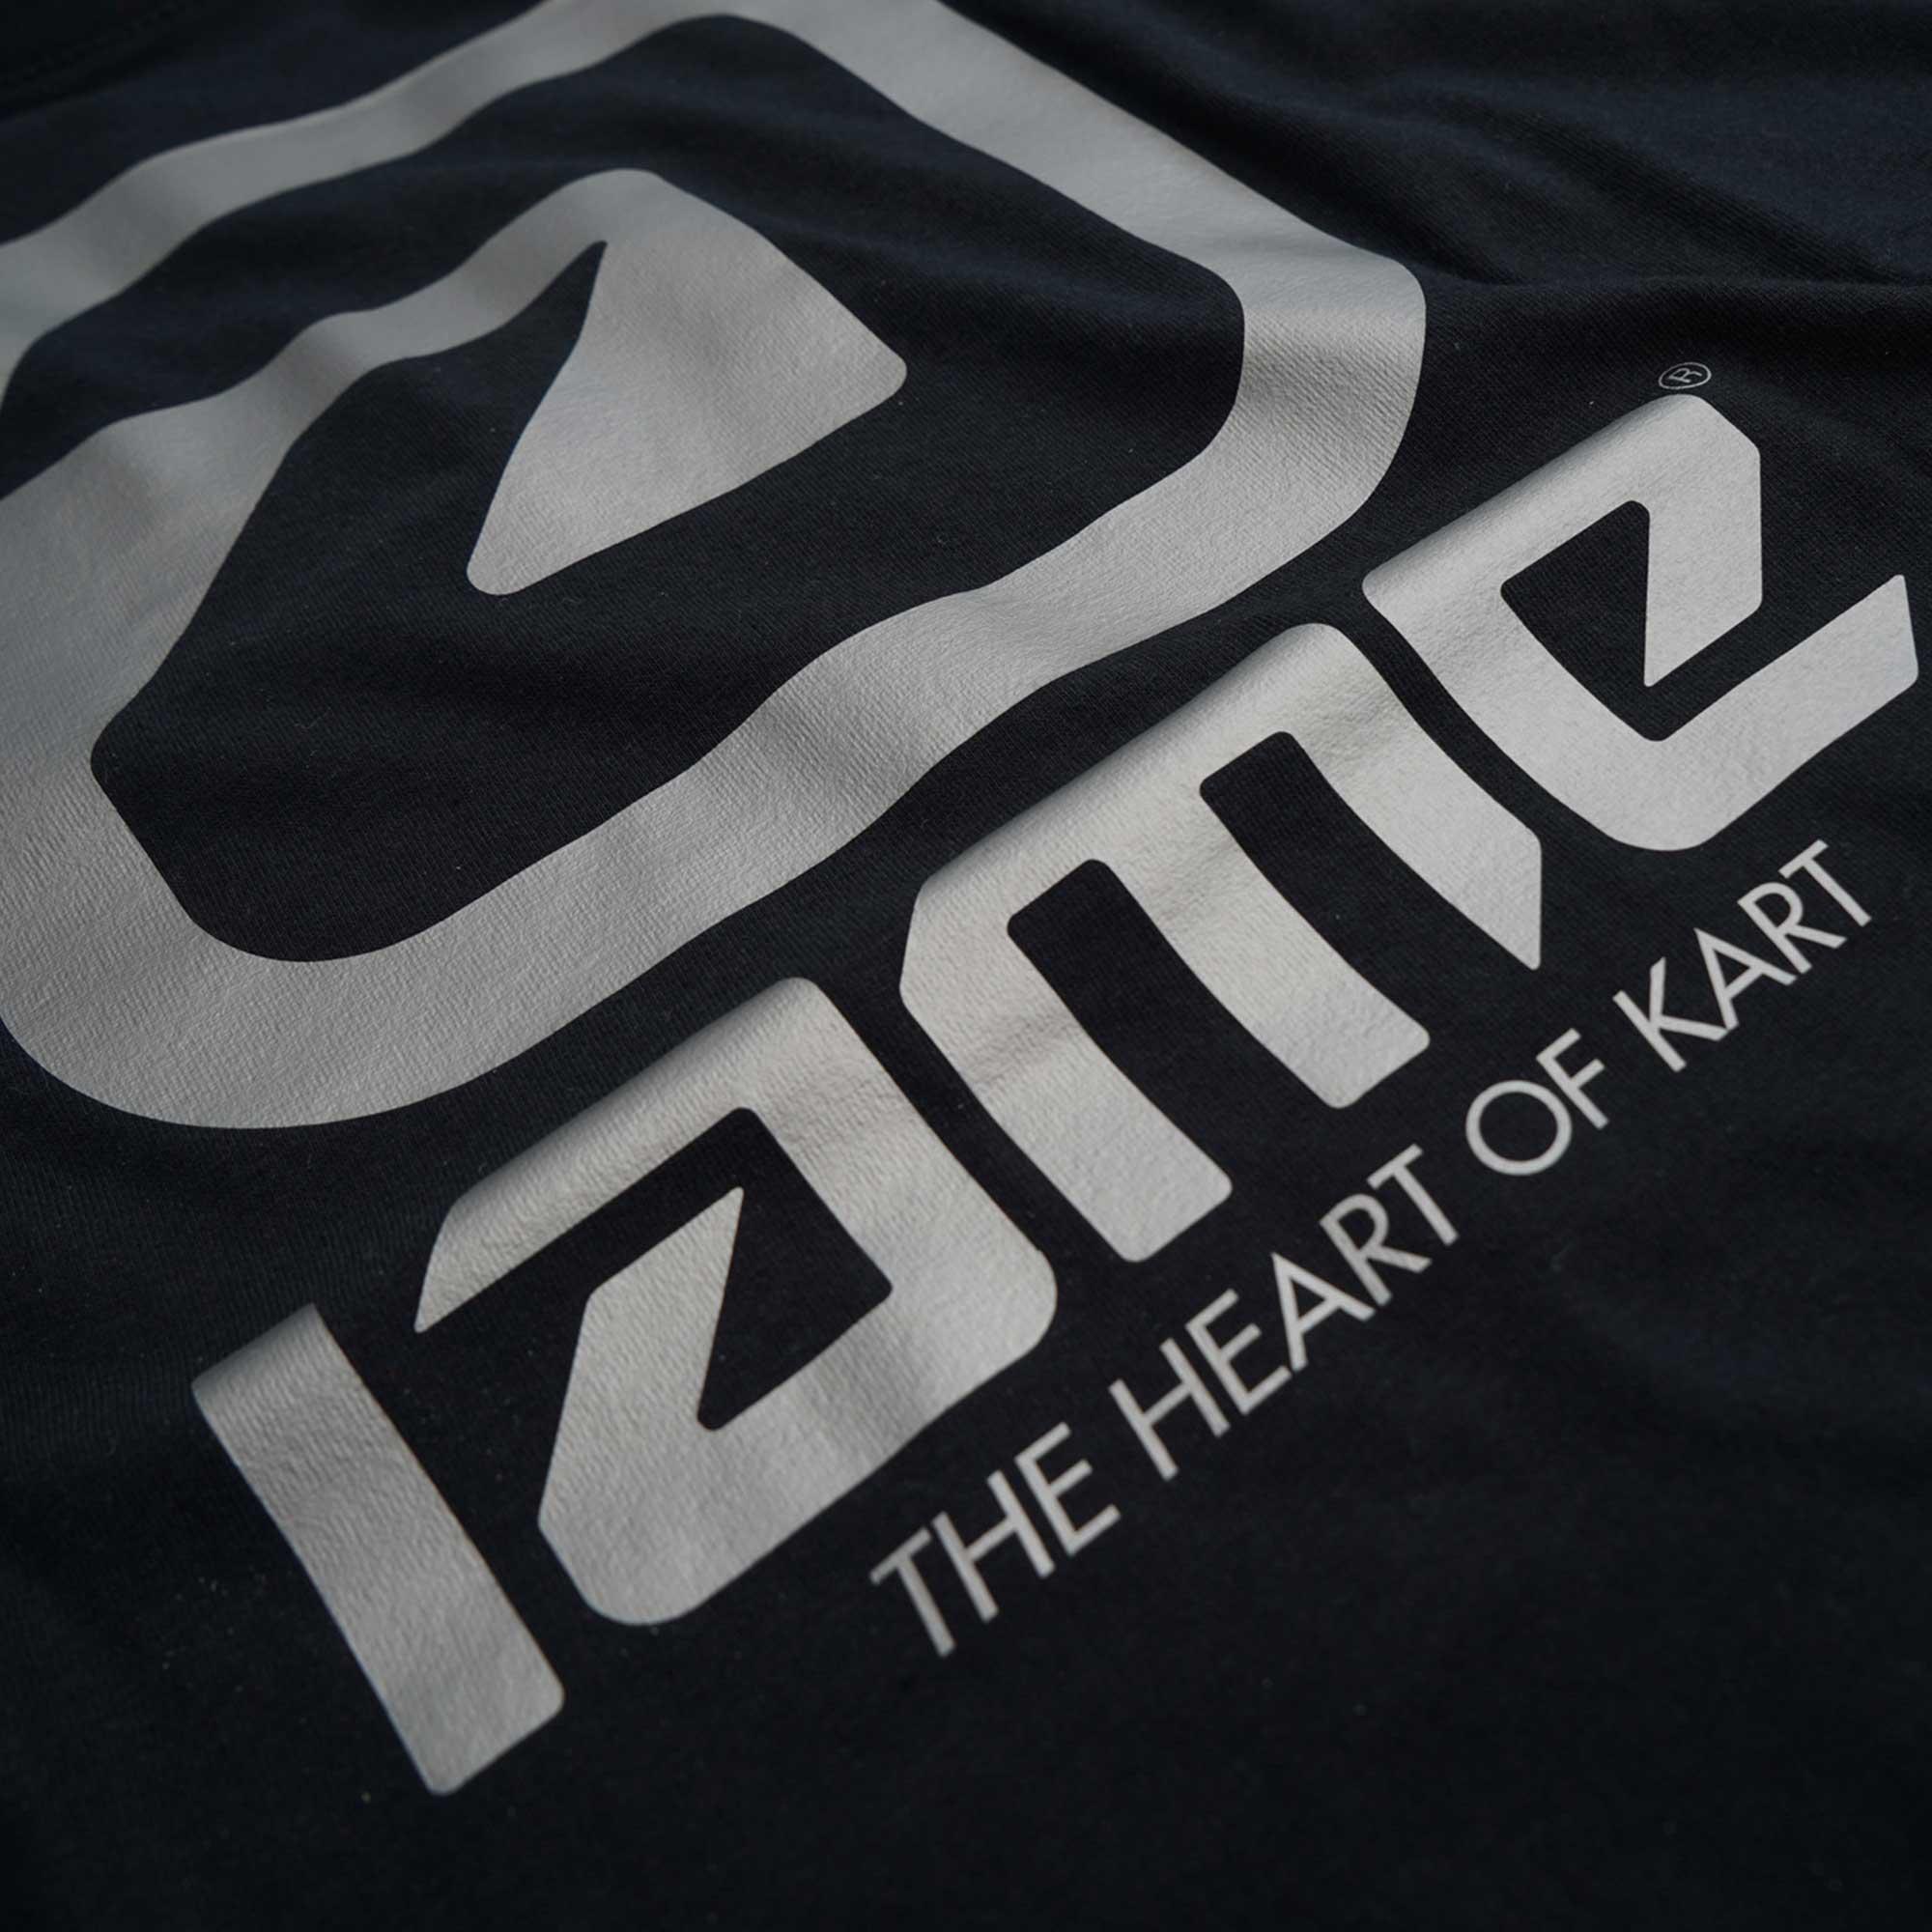 unlead-advertising-iame-the-heart-of-kart-merchandising-2